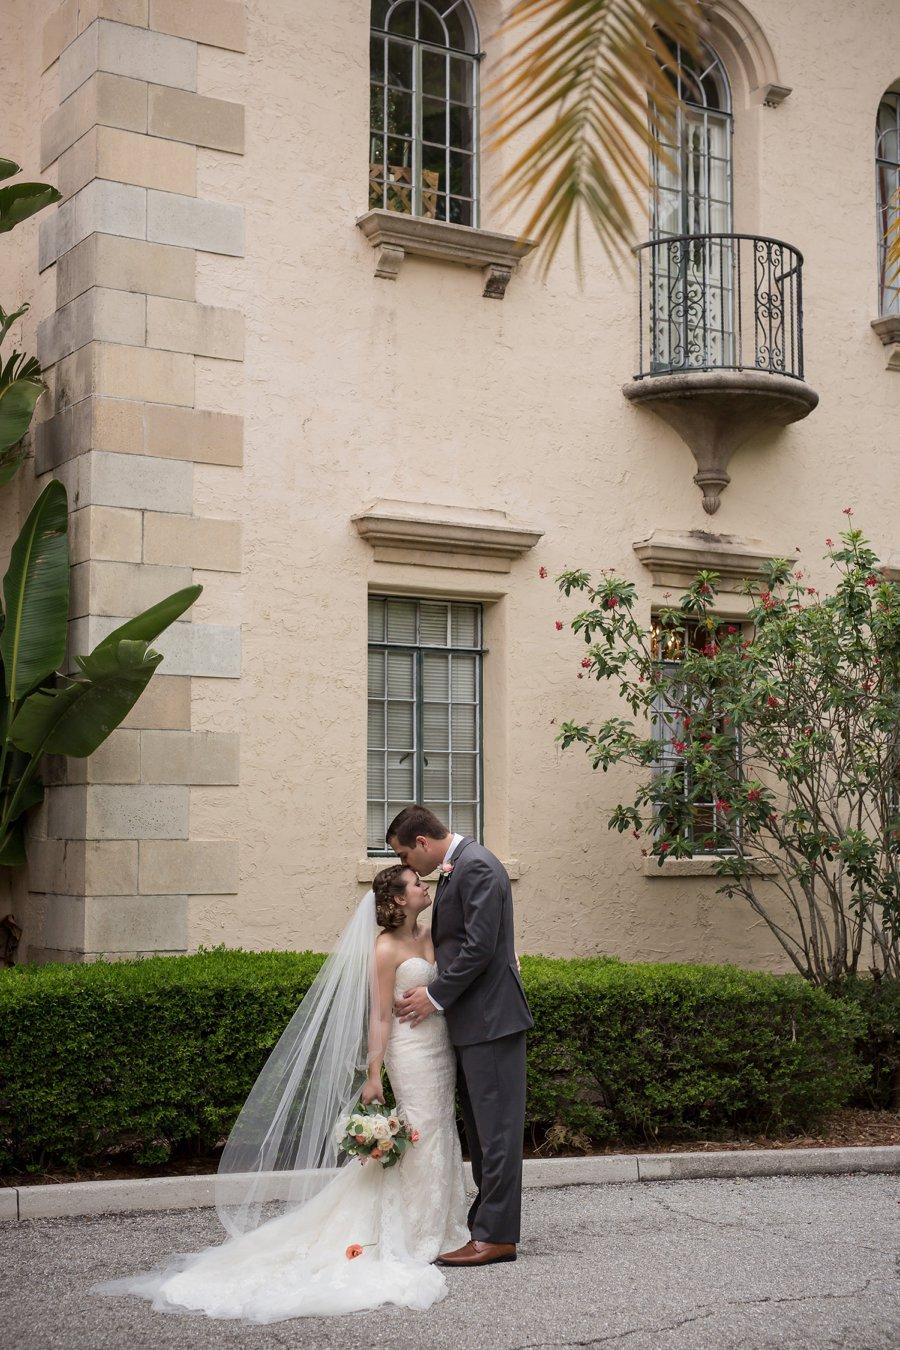 A Classic Blush & Gold Tented Sarasota Wedding Day via TheELD.com